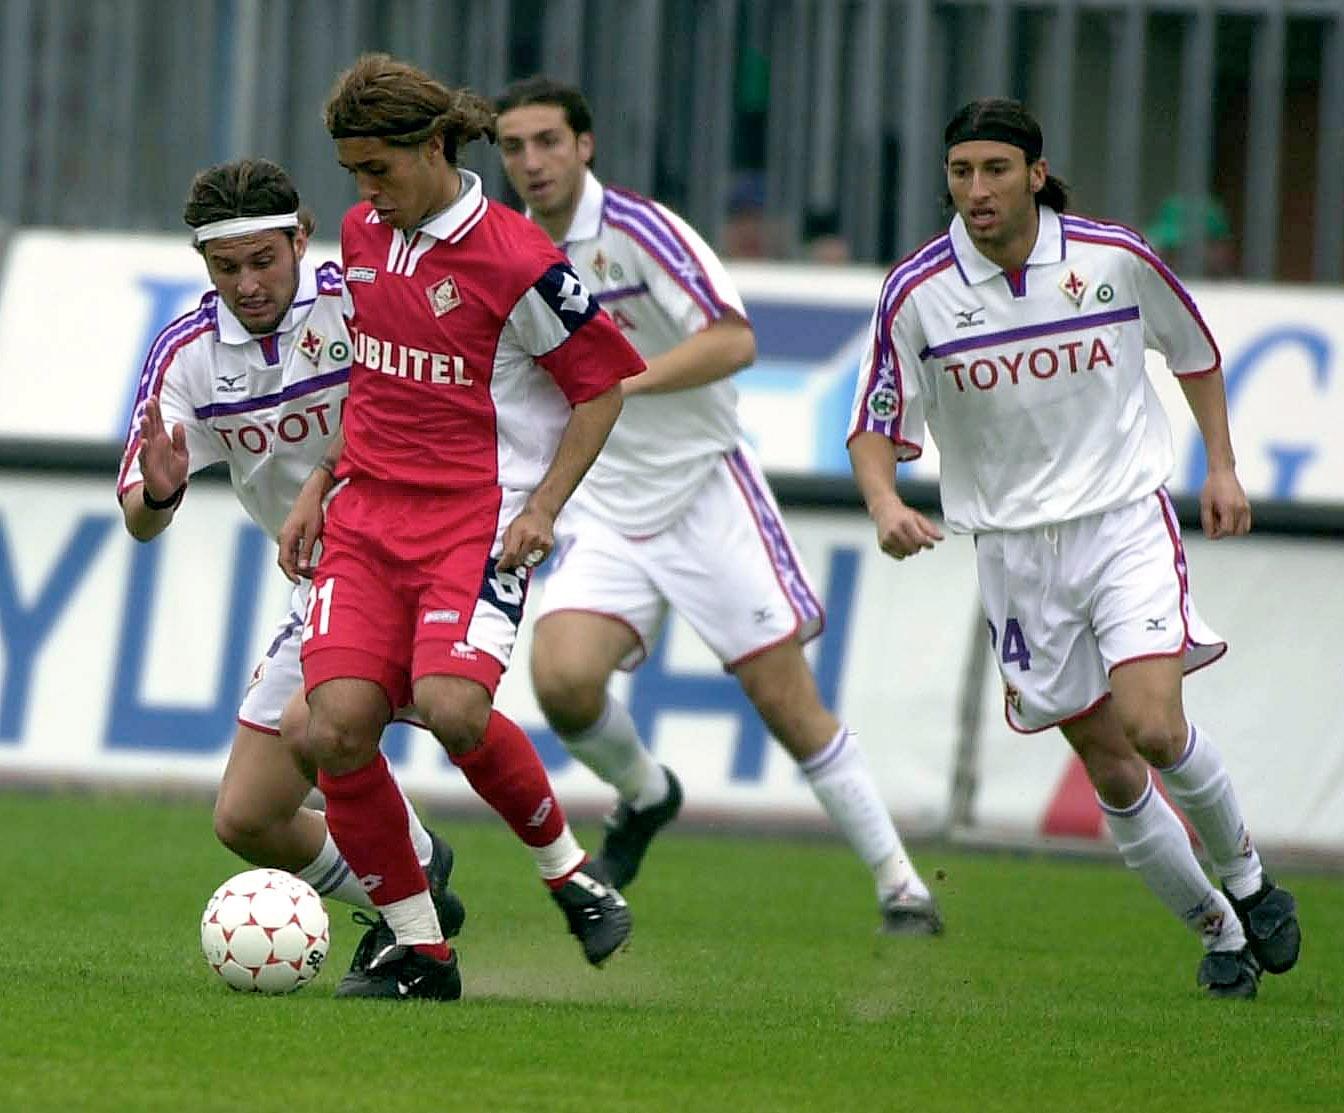 Piacenza v FiorentinaX